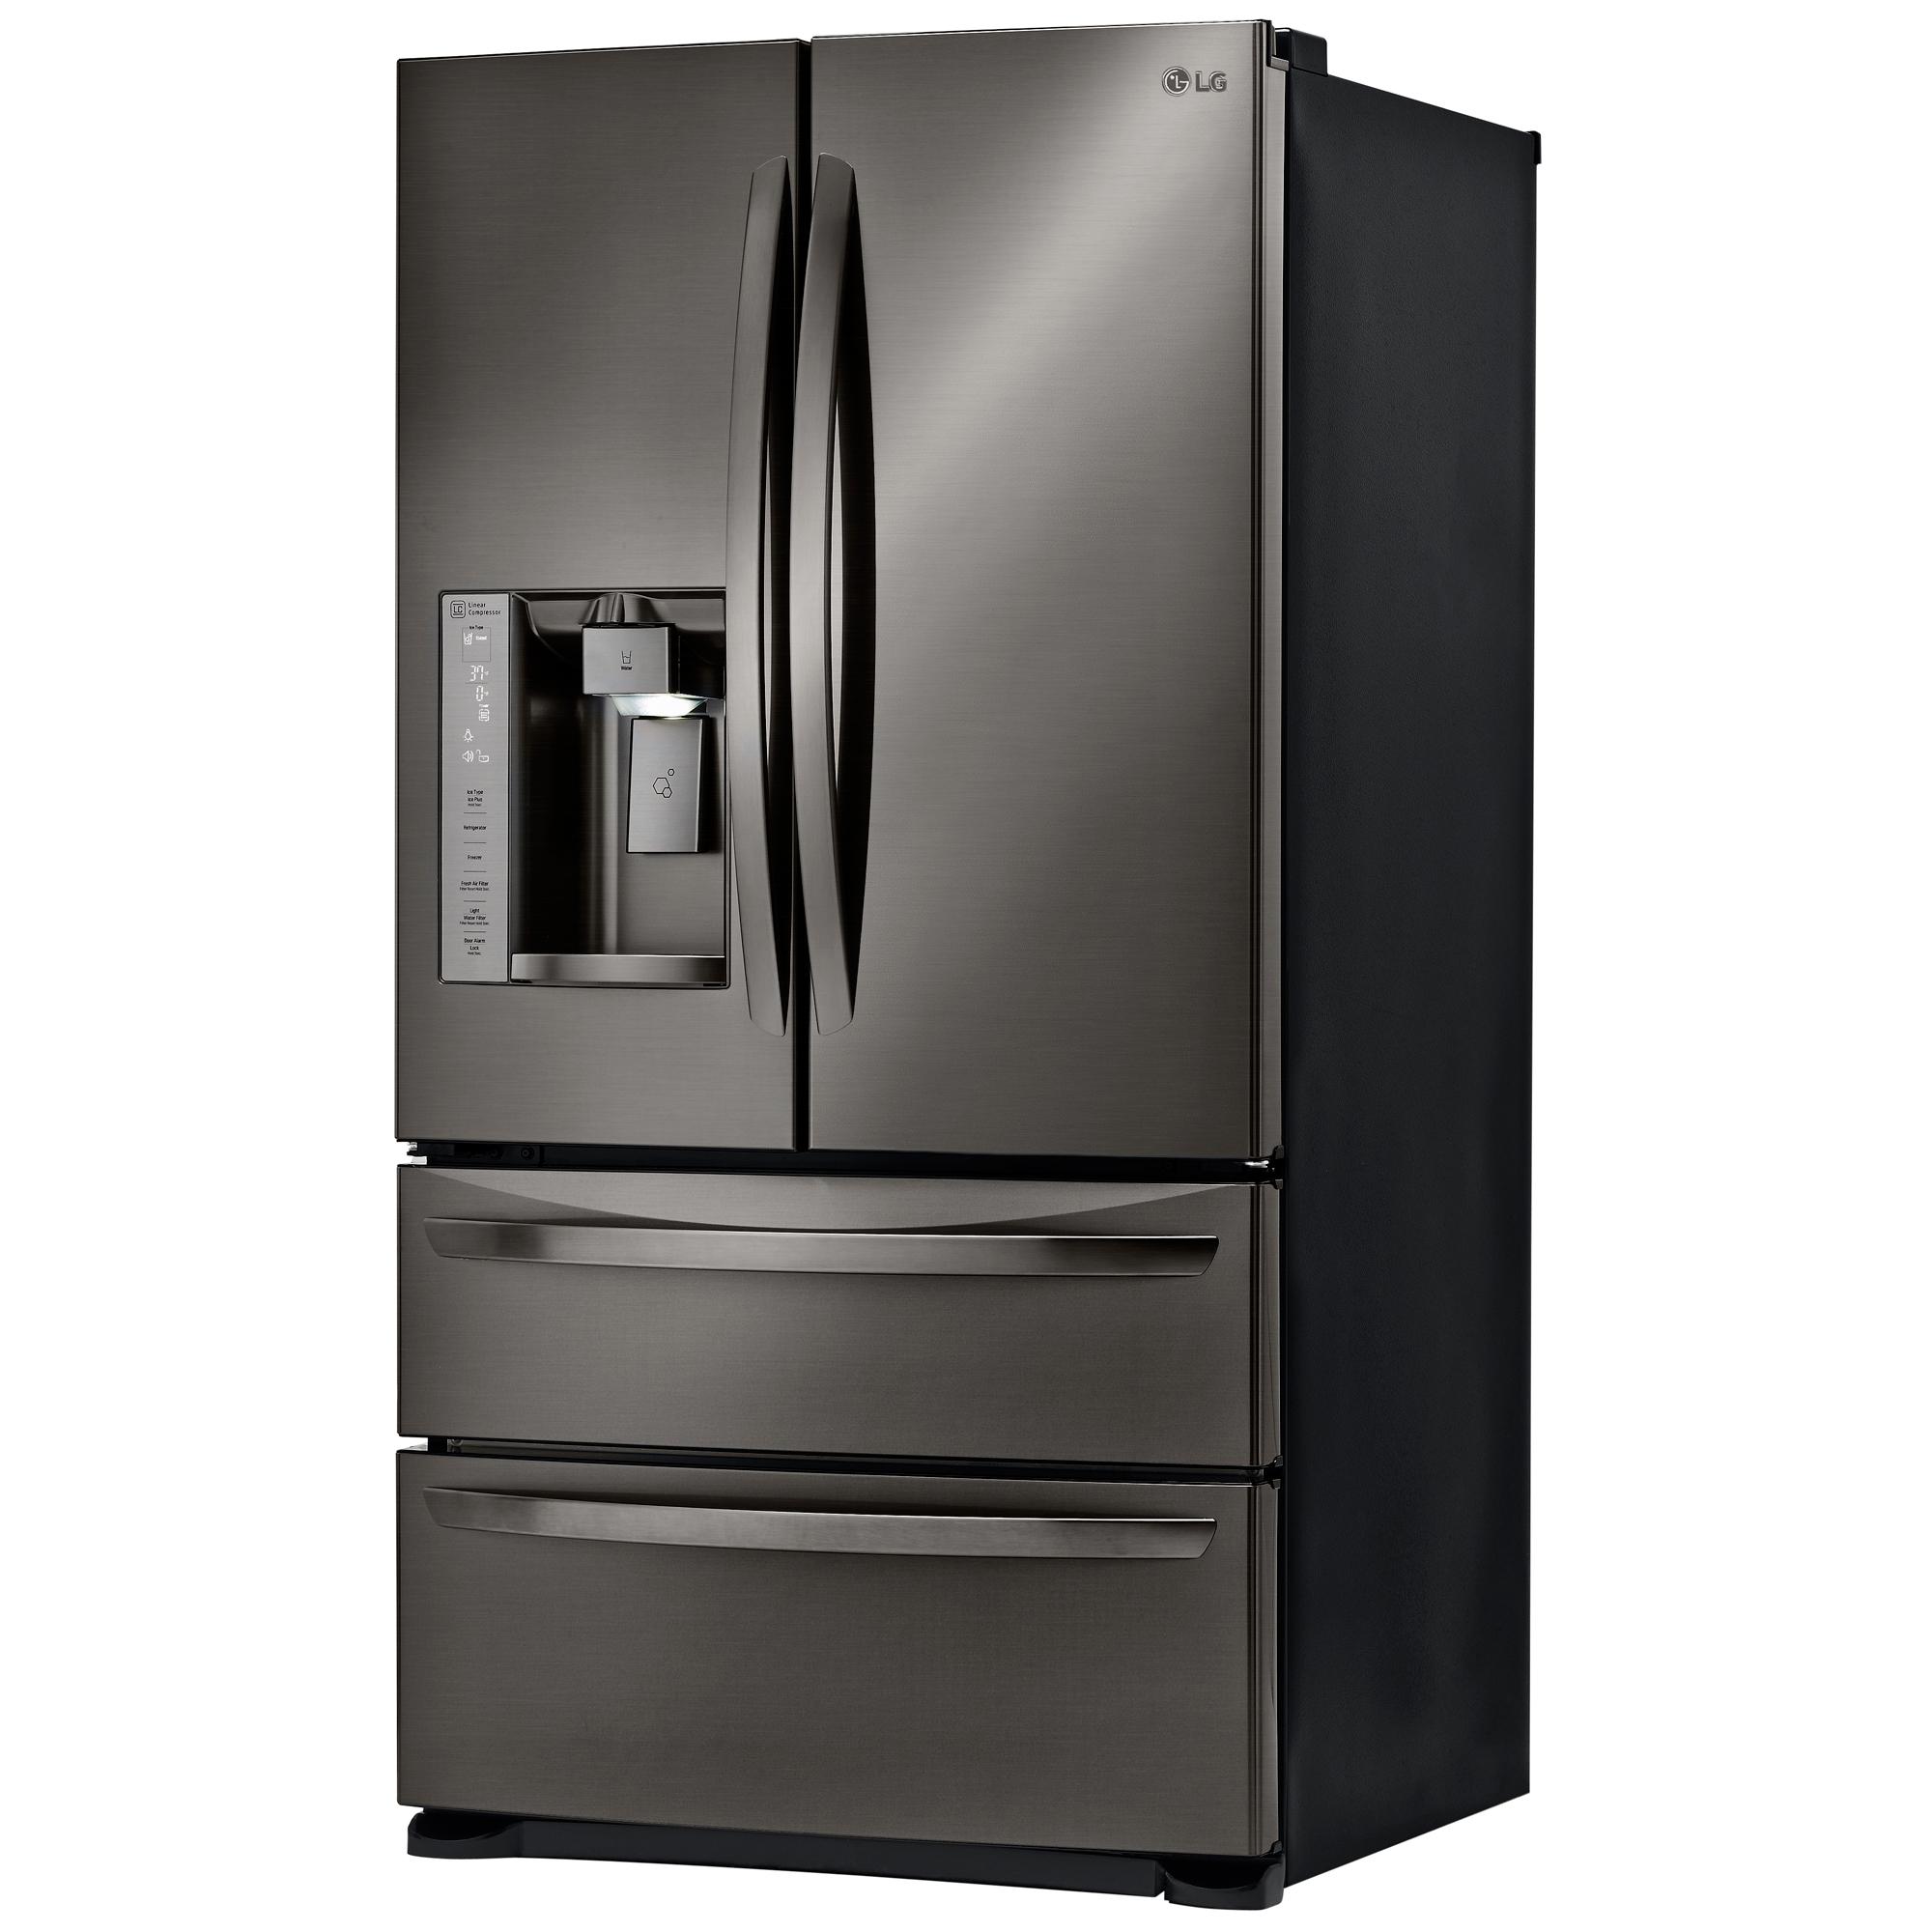 LG LMXS27626D 26.7 cu. ft. 4-Door French Door Refrigerator w/ Dual Freezer Drawers – Black Stainless